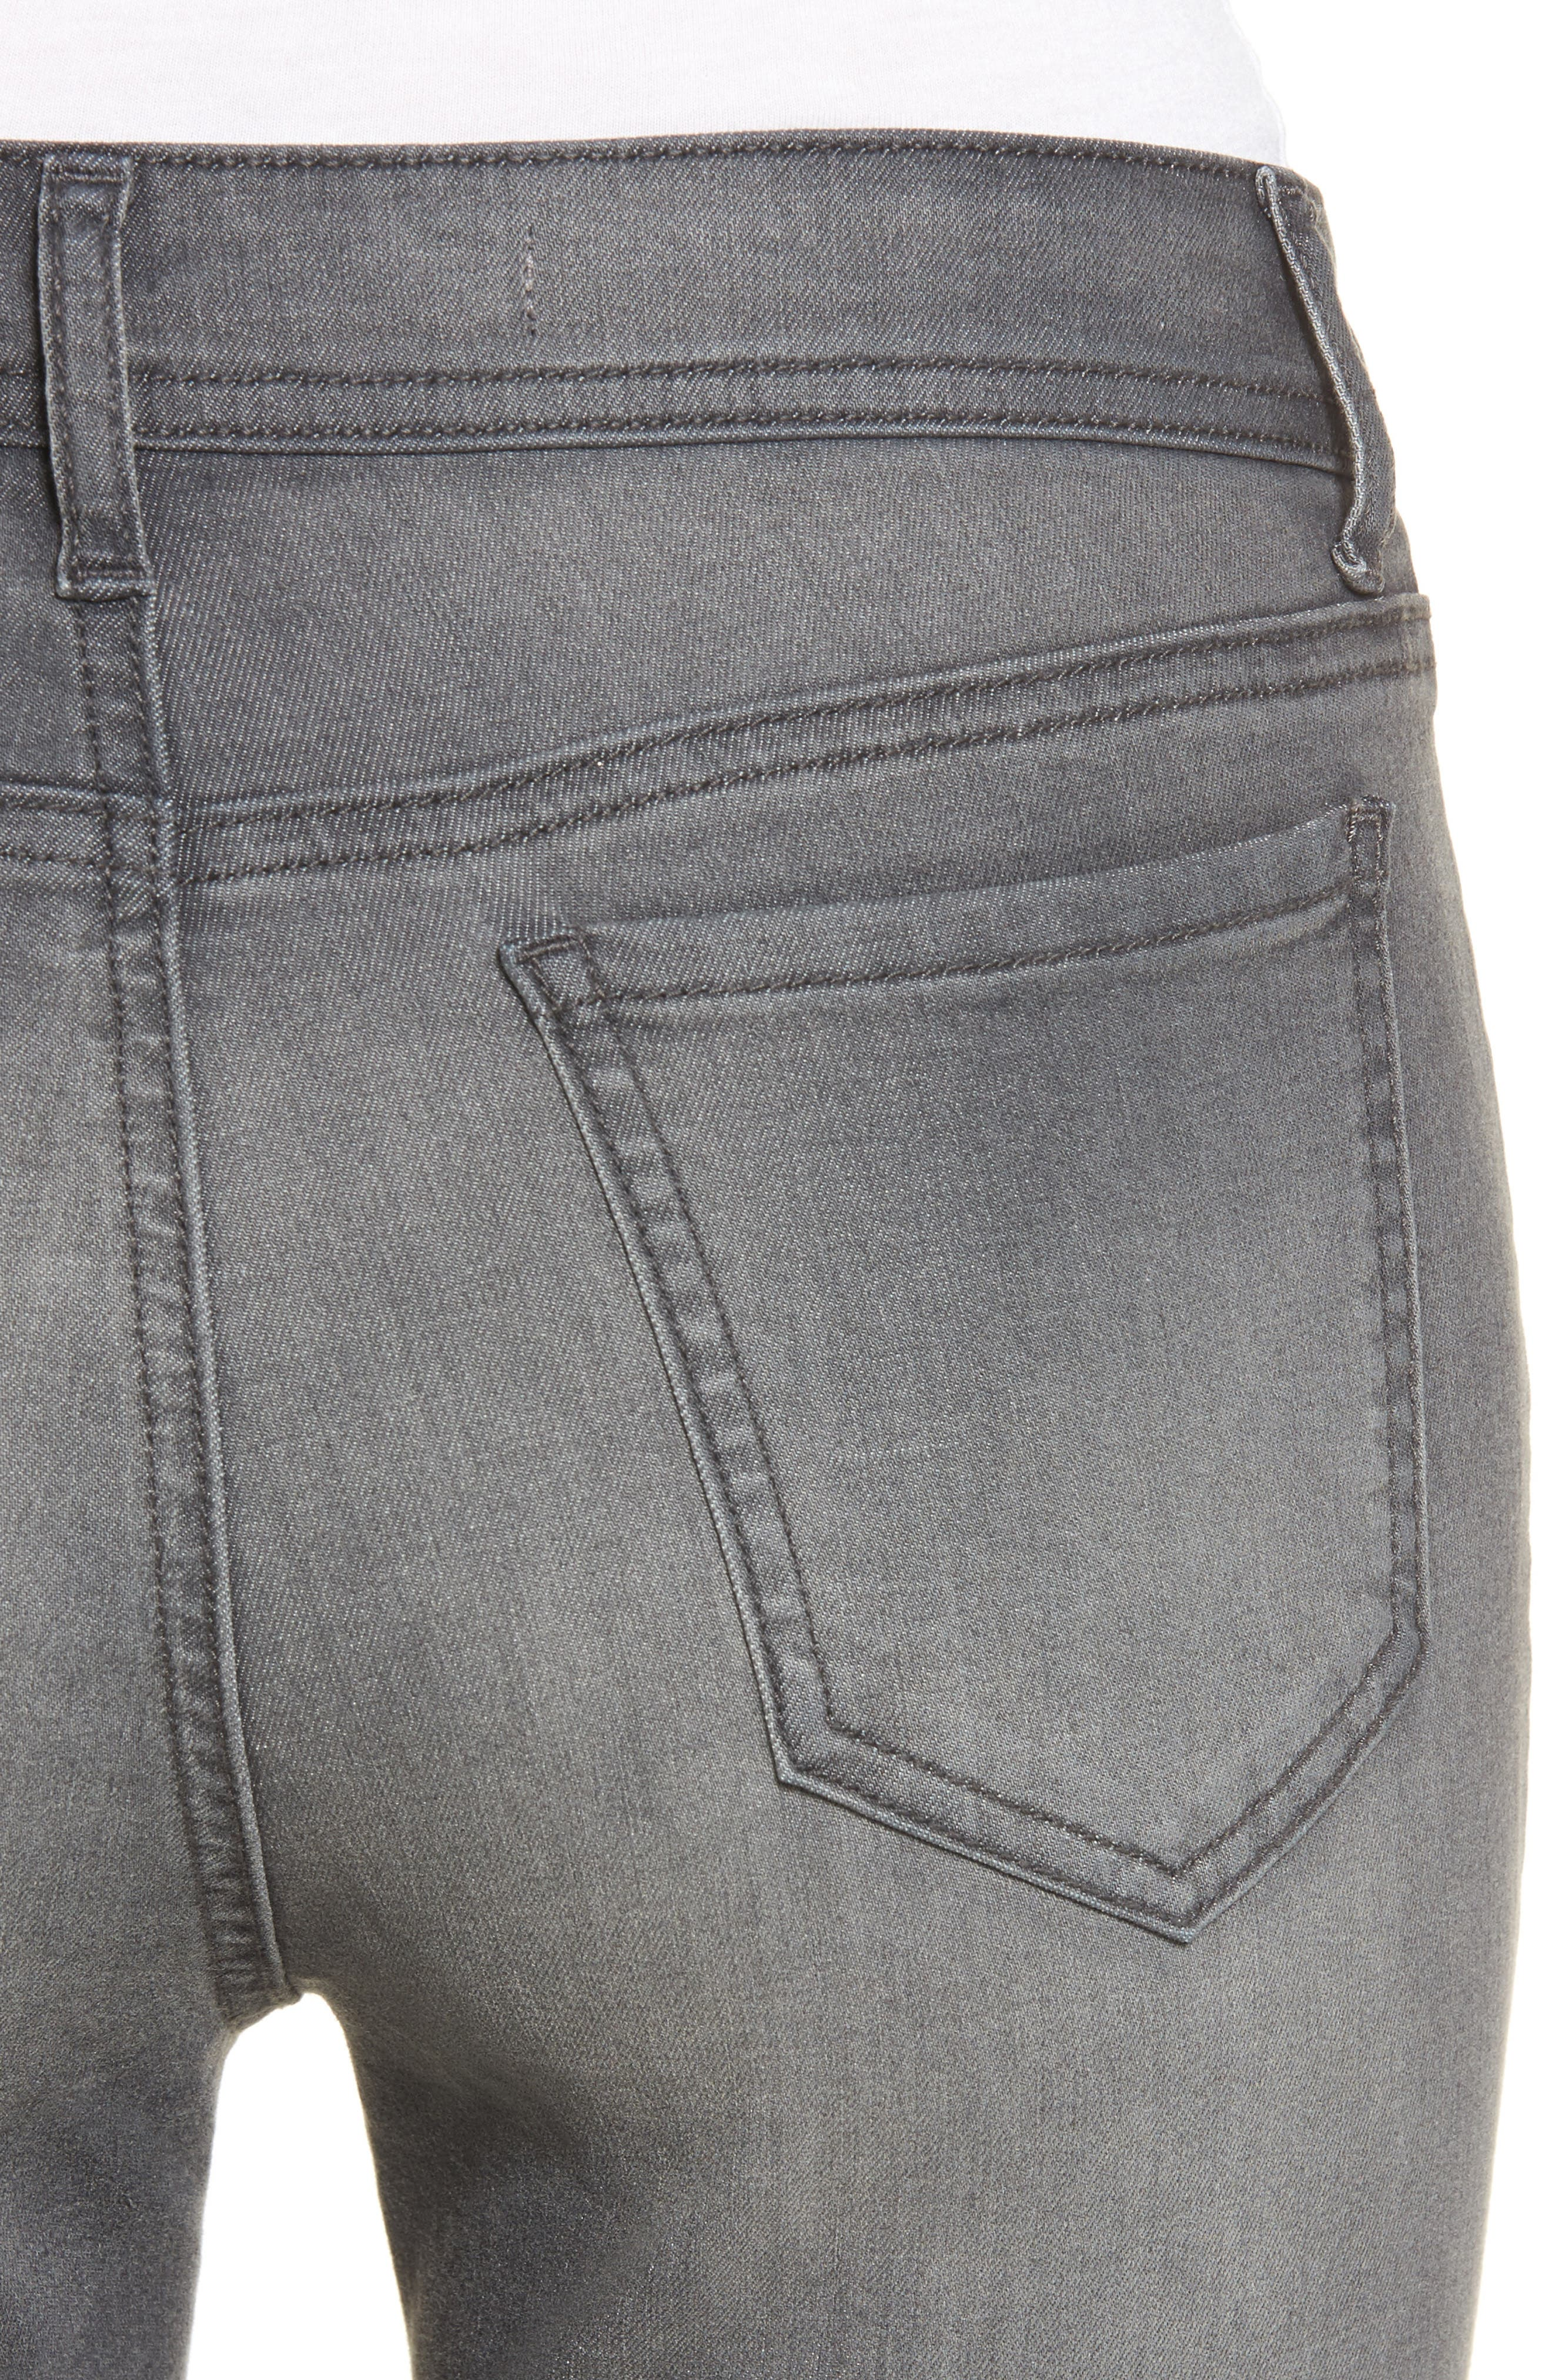 Ripped Skinny Jeans,                             Alternate thumbnail 4, color,                             Rebelite Charcoal